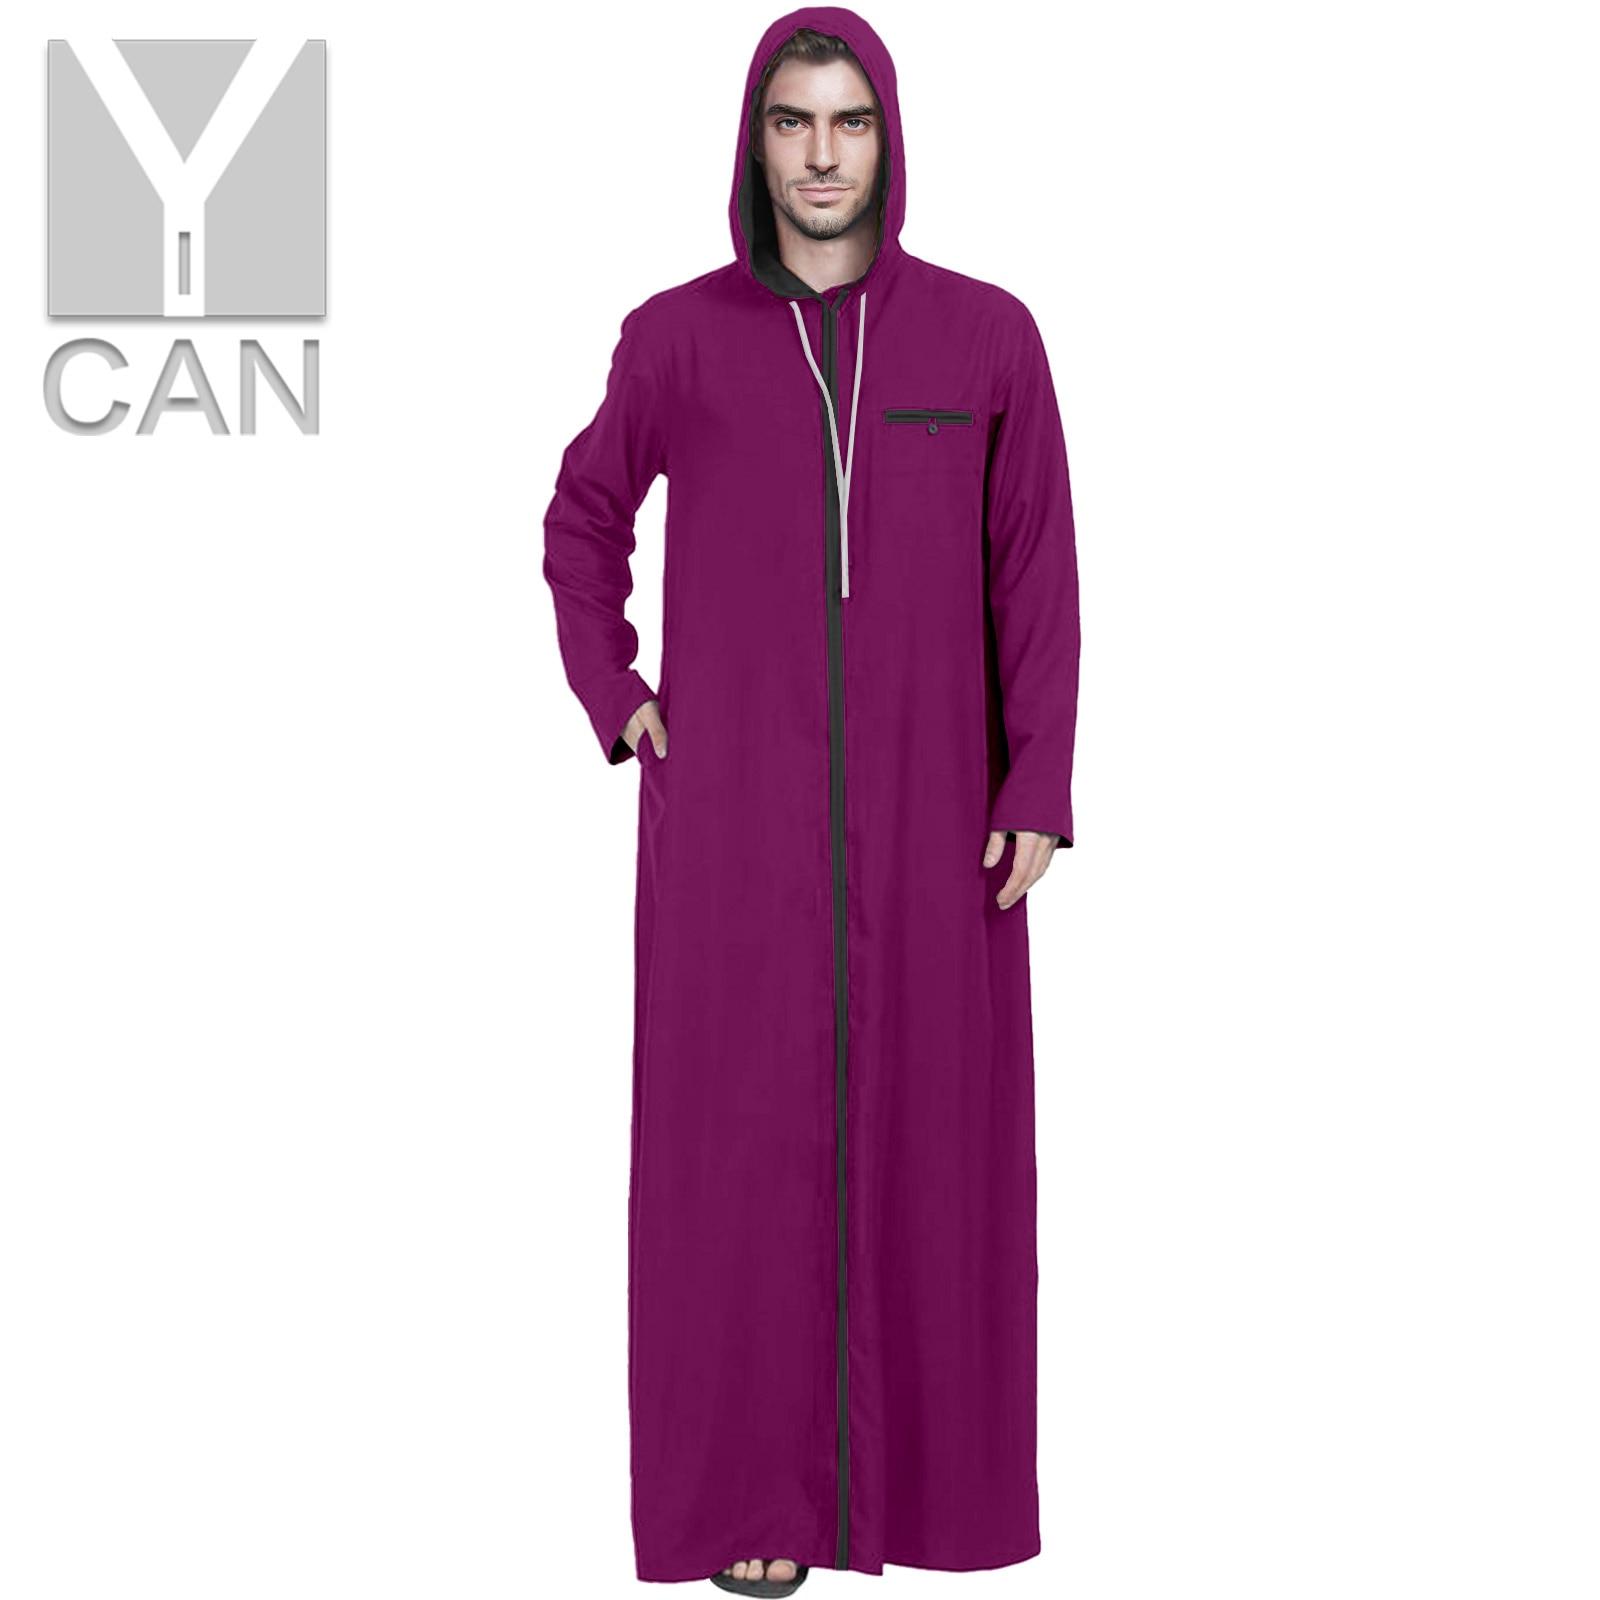 Y-CAN Mens Jubba Thobe Muslim Fashion Long Sleeve Robe Saudi Arab Thobe Jubba Hooded Kaftan Middle East Islamic Clothing Y211001